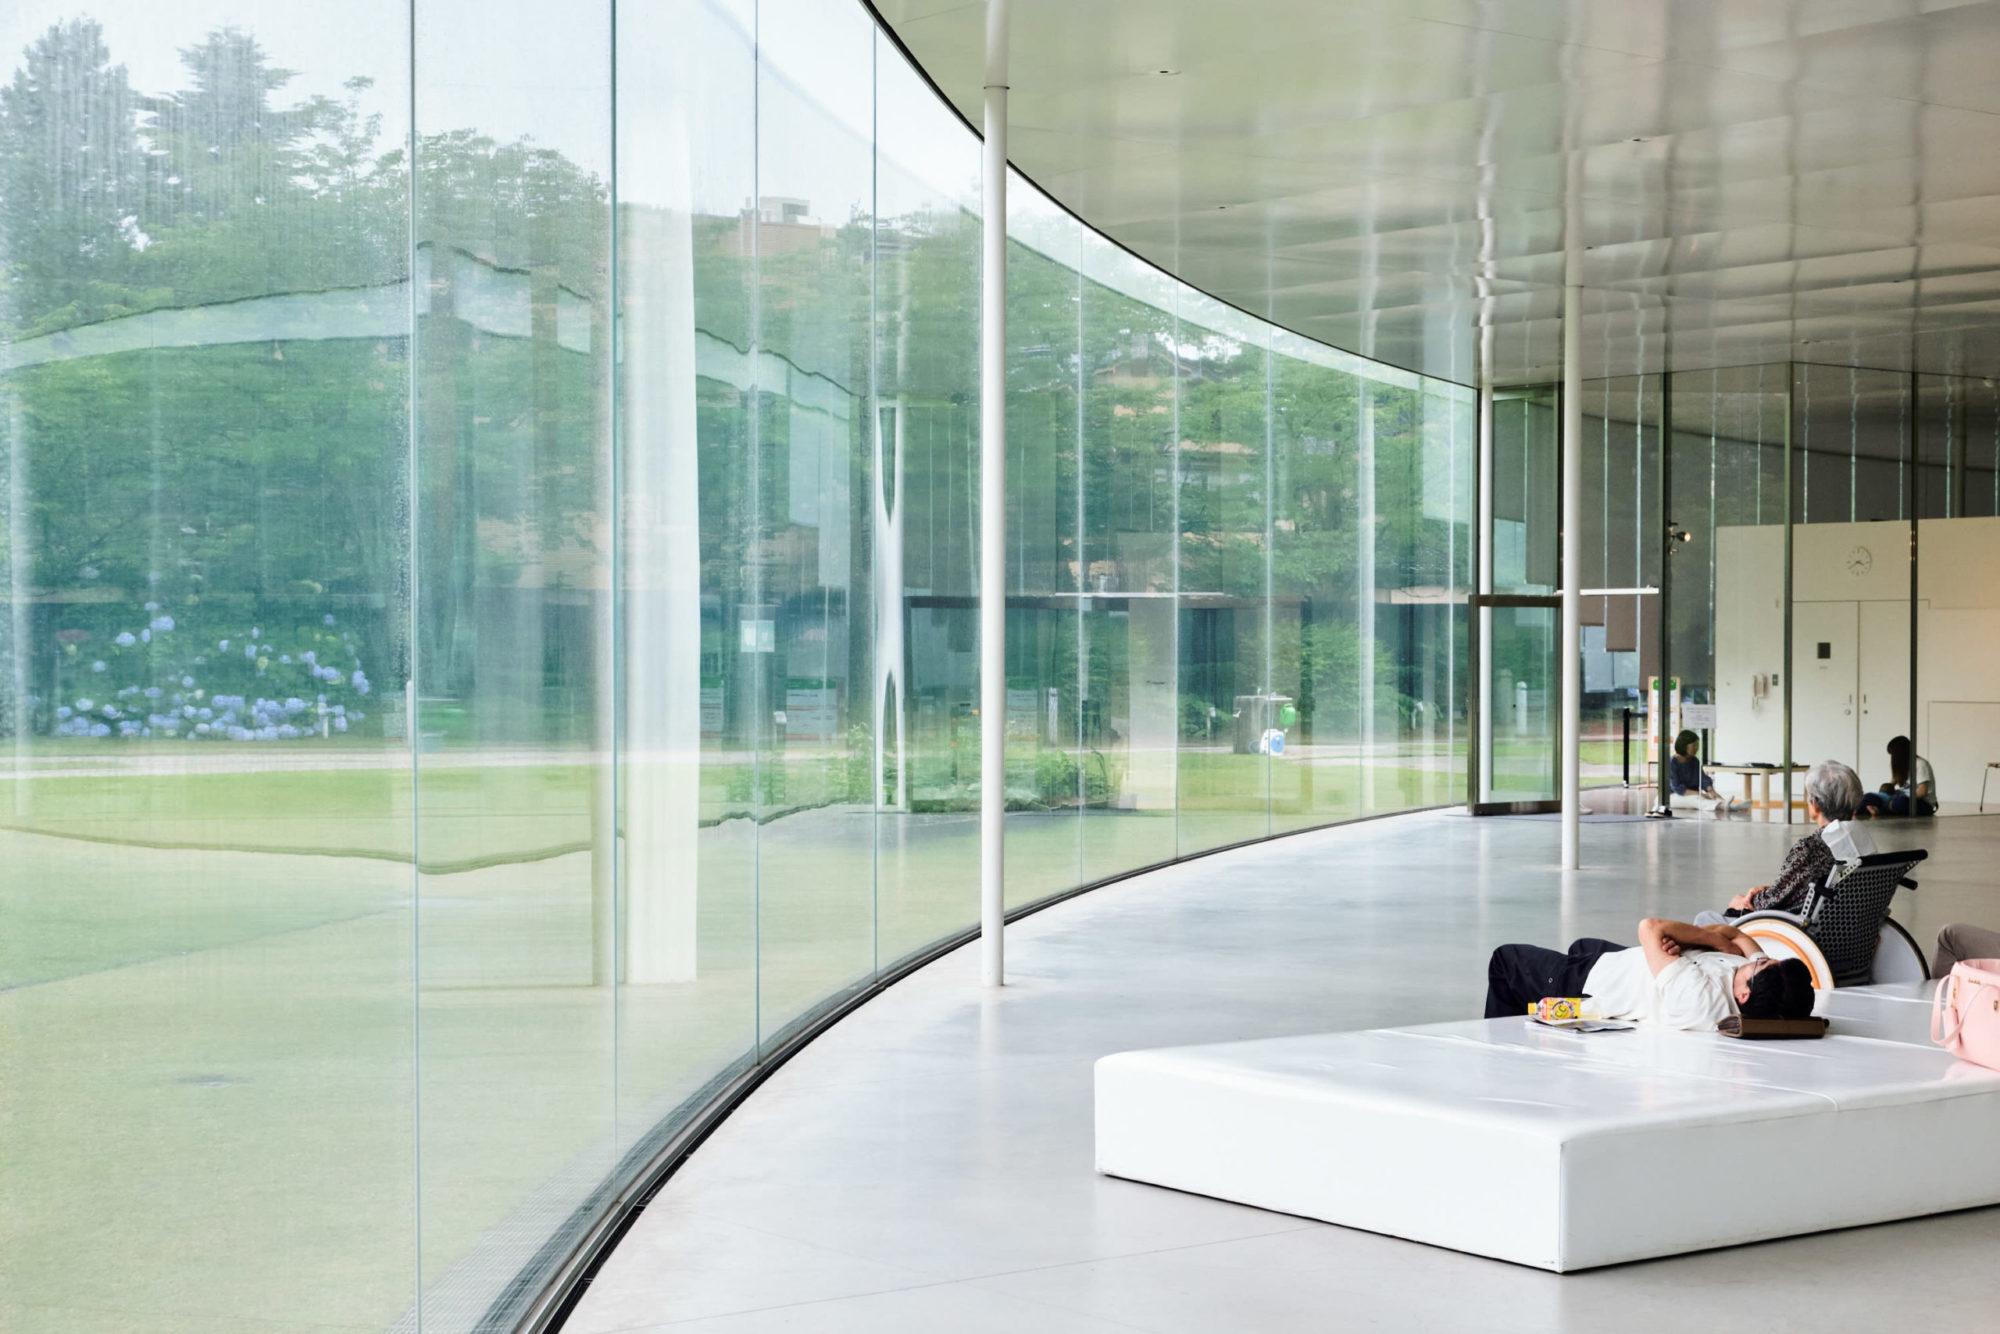 sanaa-kazuyo-sejima-ryue-nishizawa-august-fischer-21st-century-museum-of-contemporary-art-kanazawa copy 2